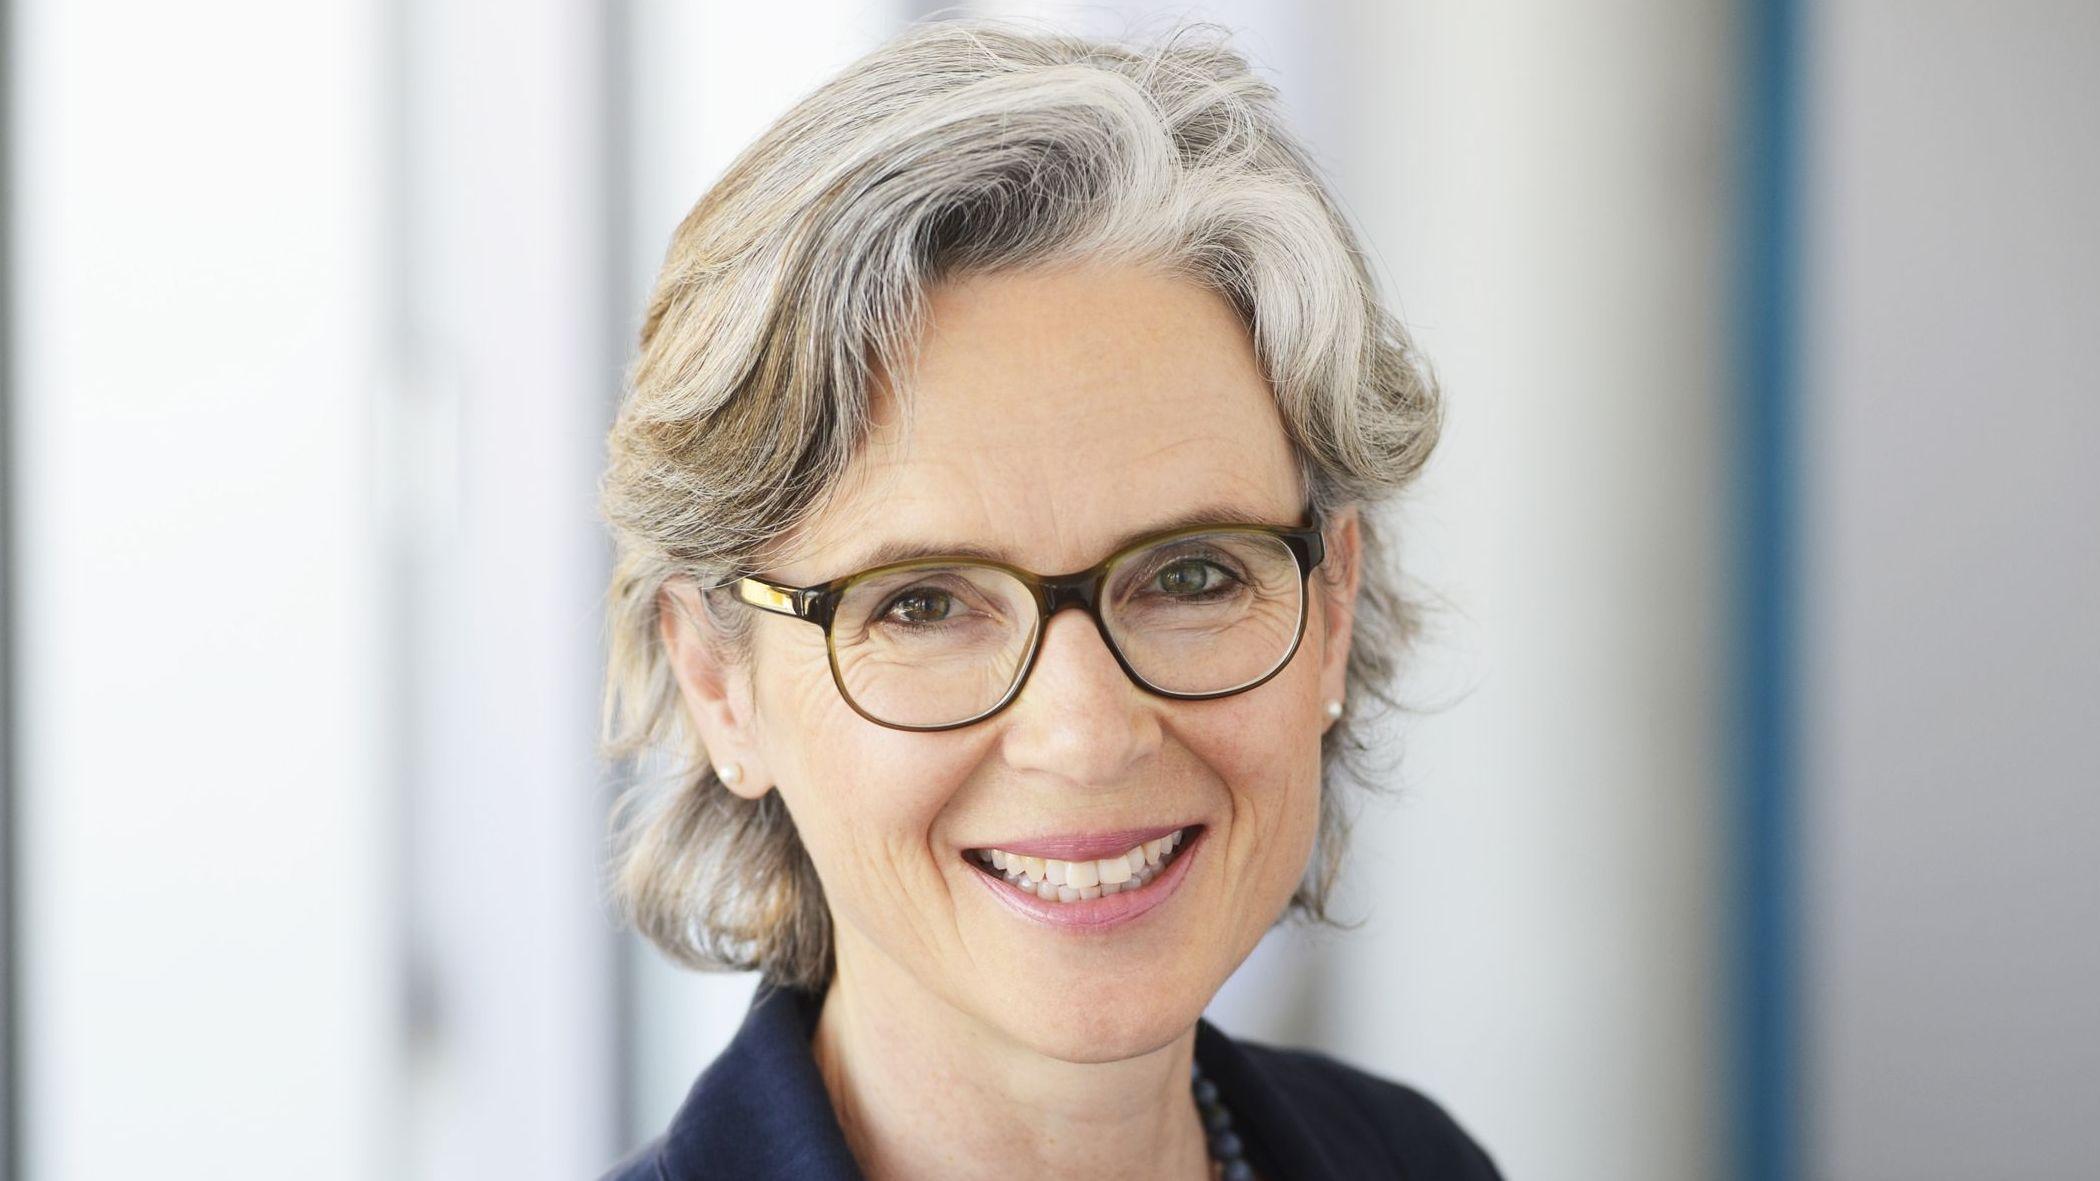 Isabel Grüner, Kunstbeauftragte des Stuttgarter Robert-Bosch-Krankenhauses